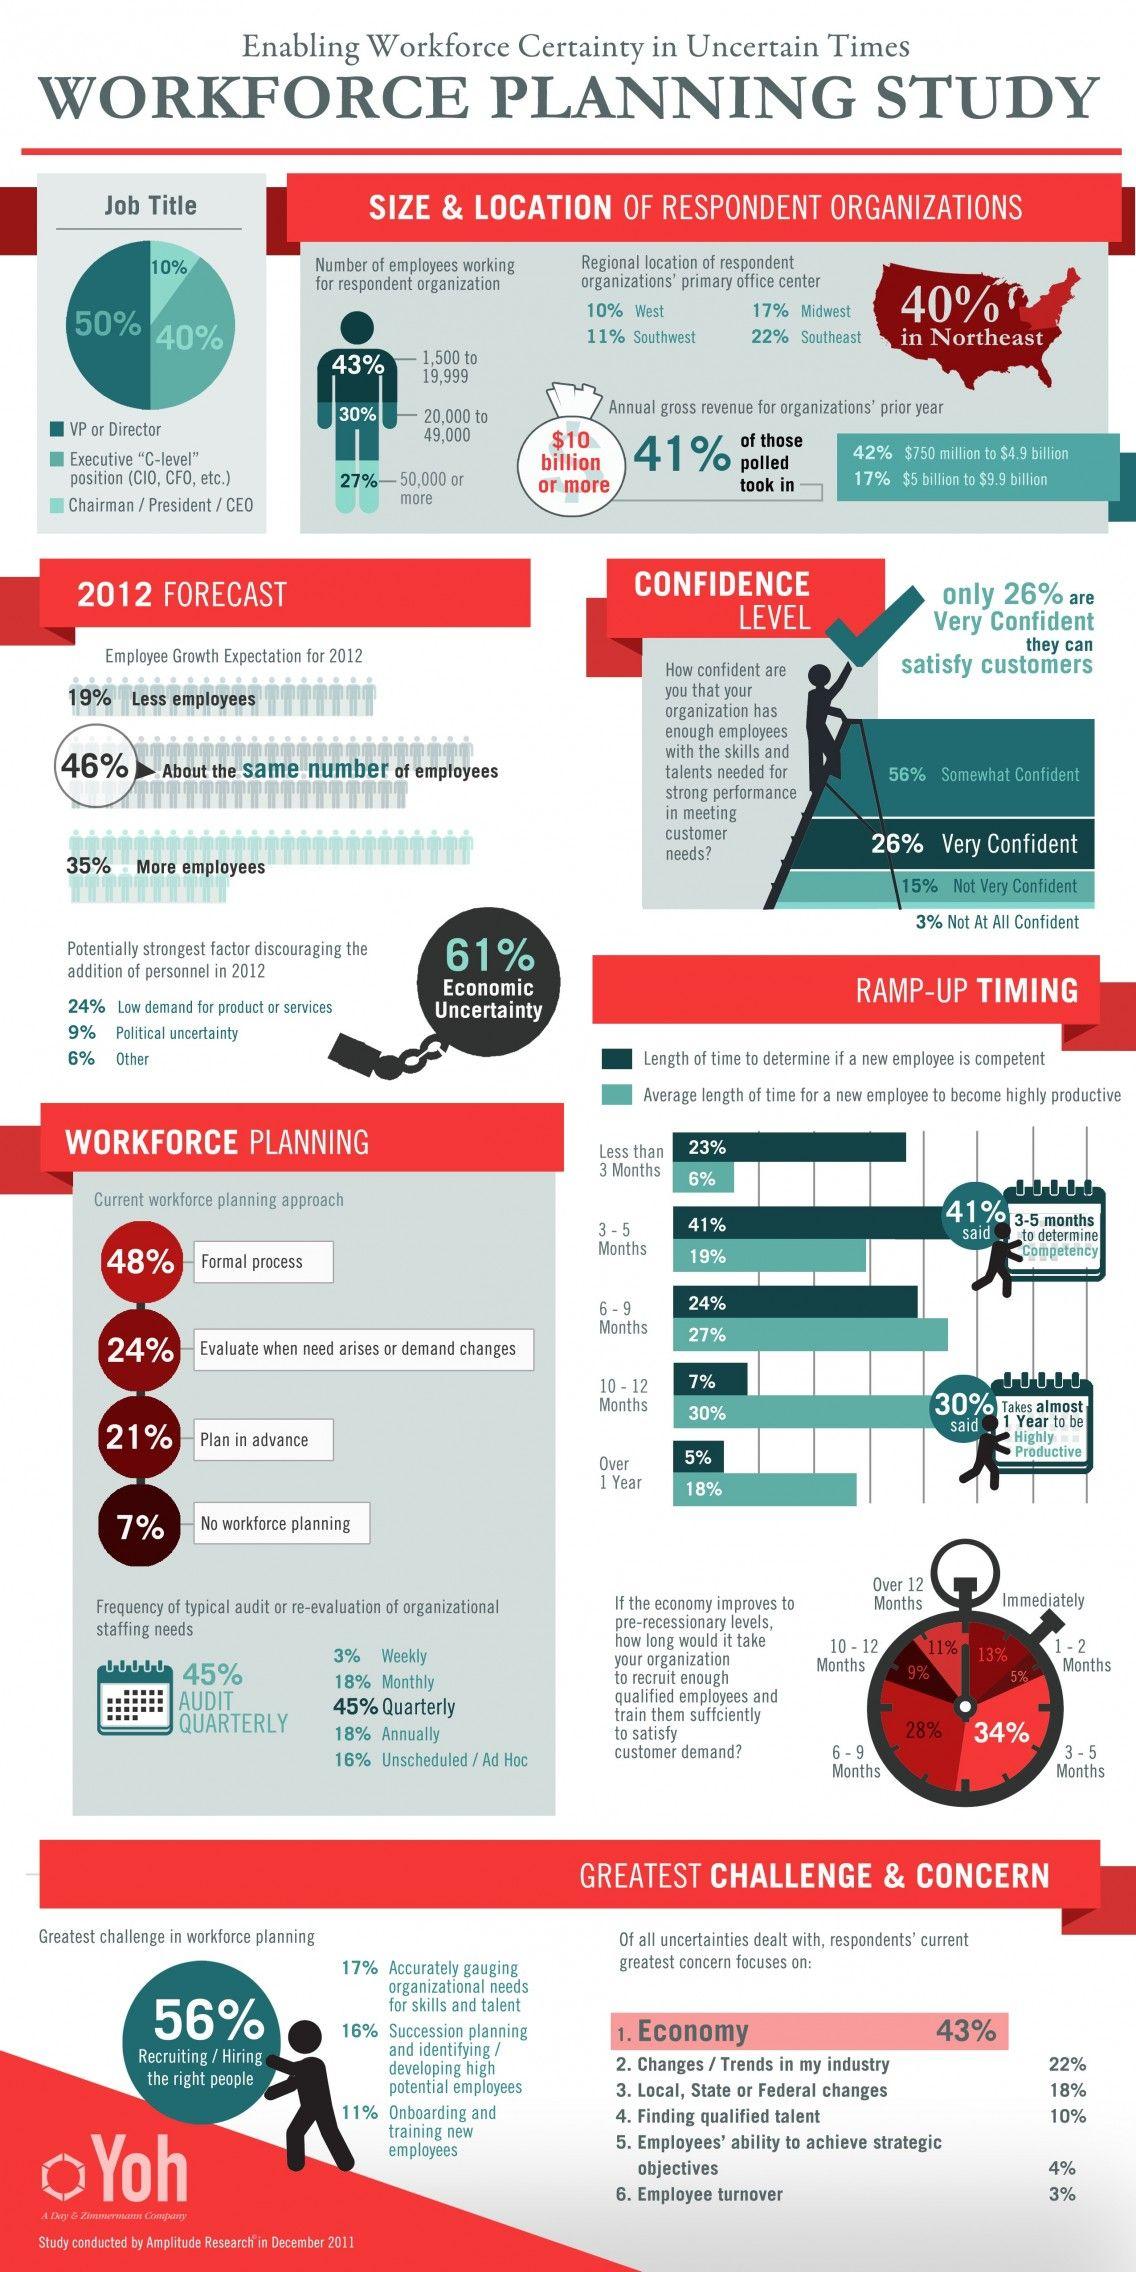 Workforce Planning Study Infographic